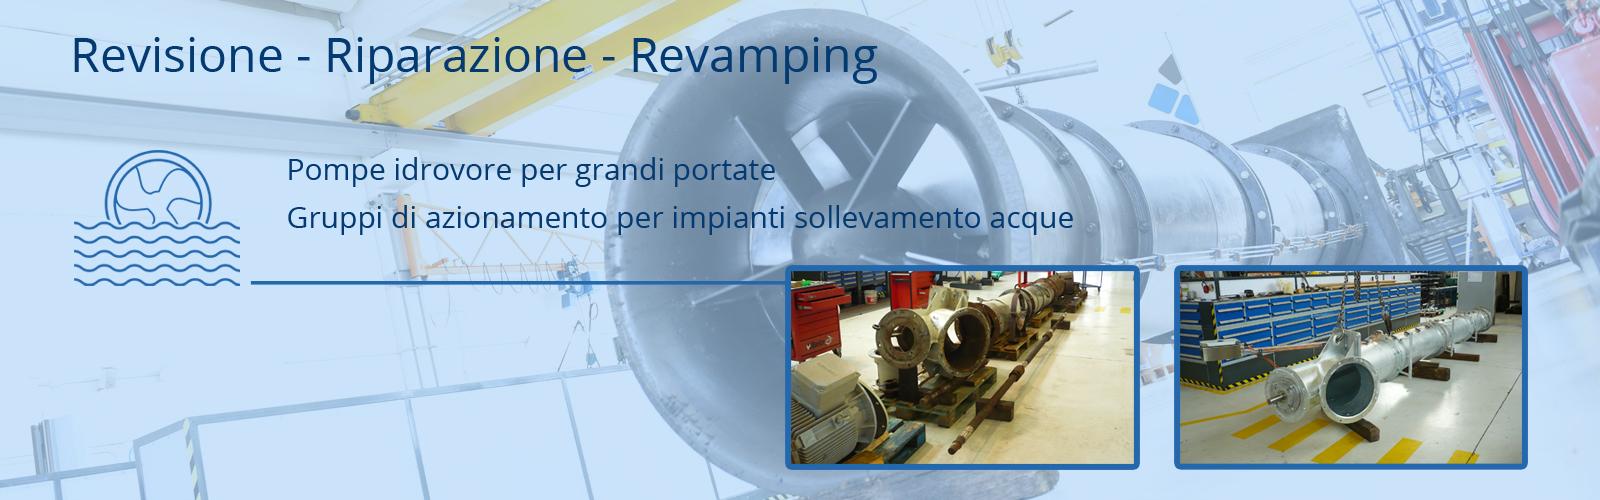 http://www.moromeccanica.it/wp-content/uploads/2015/01/slide_acqua.jpg